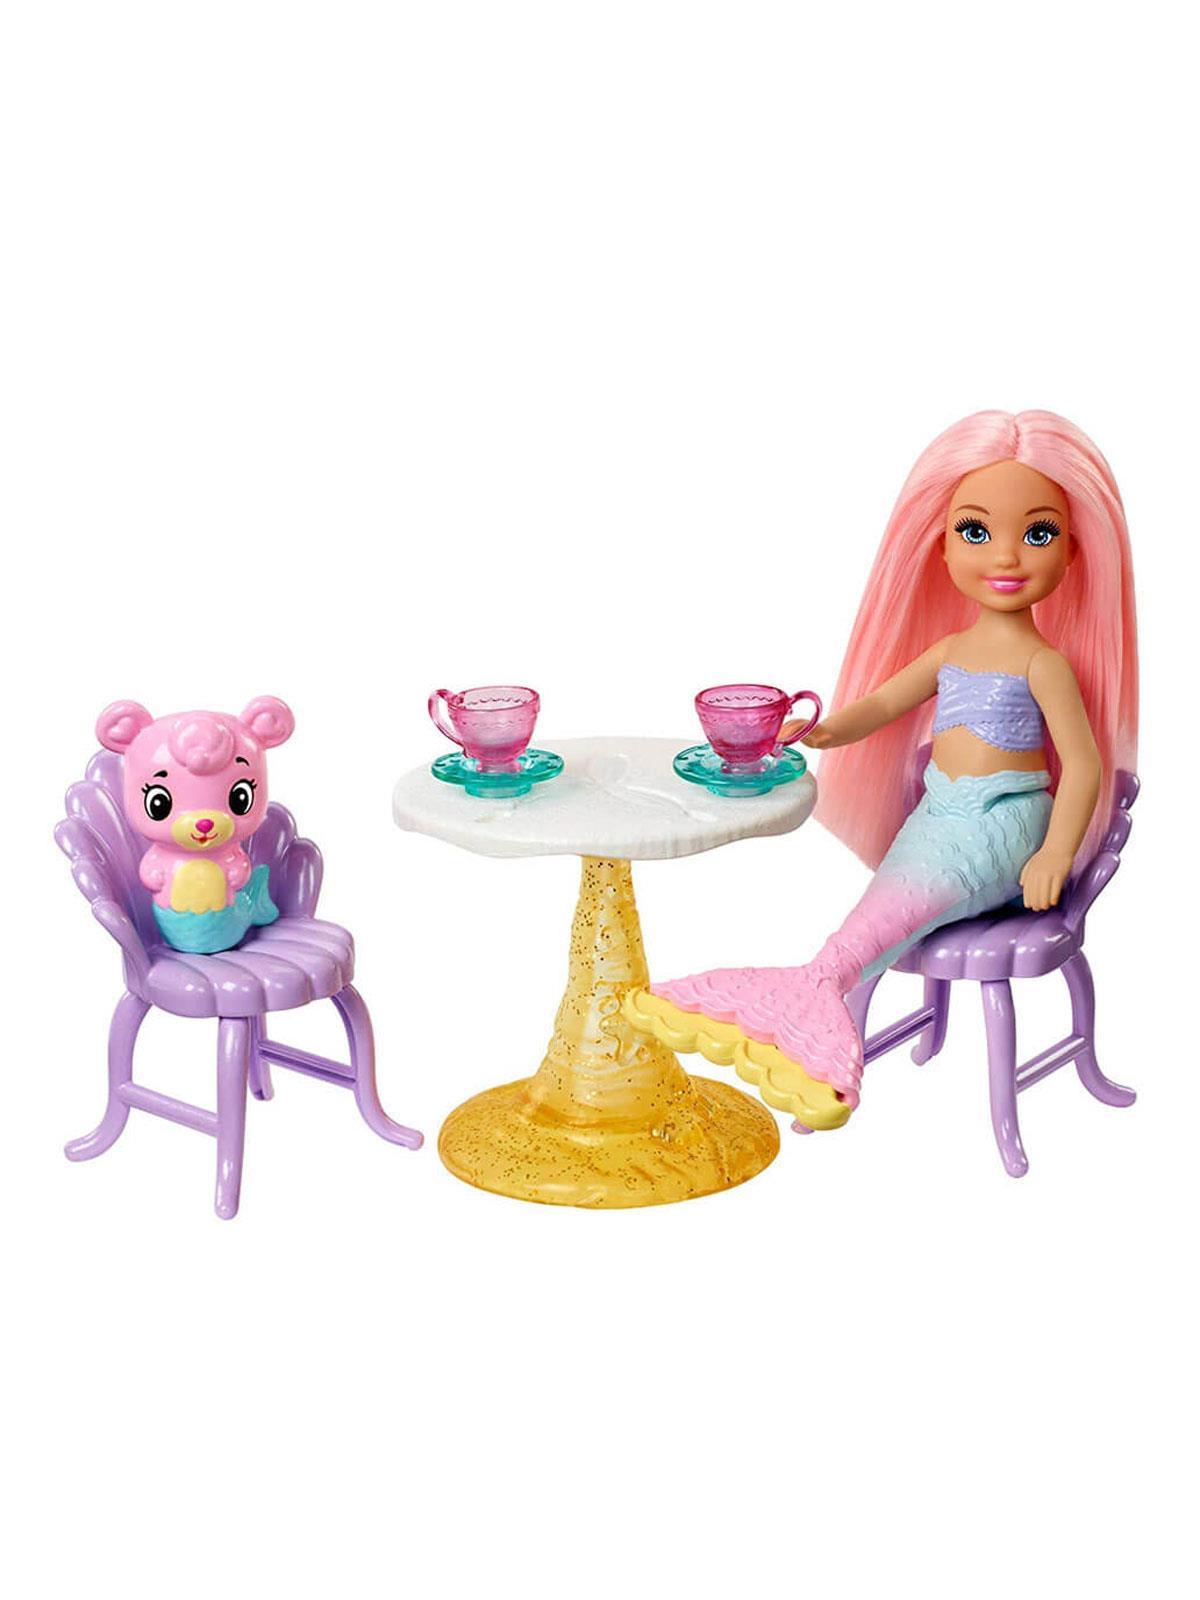 Barbie Dreamtopia Deniz Kizi Chelsea Ve Sato Oyun Seti Fiyati Mtl